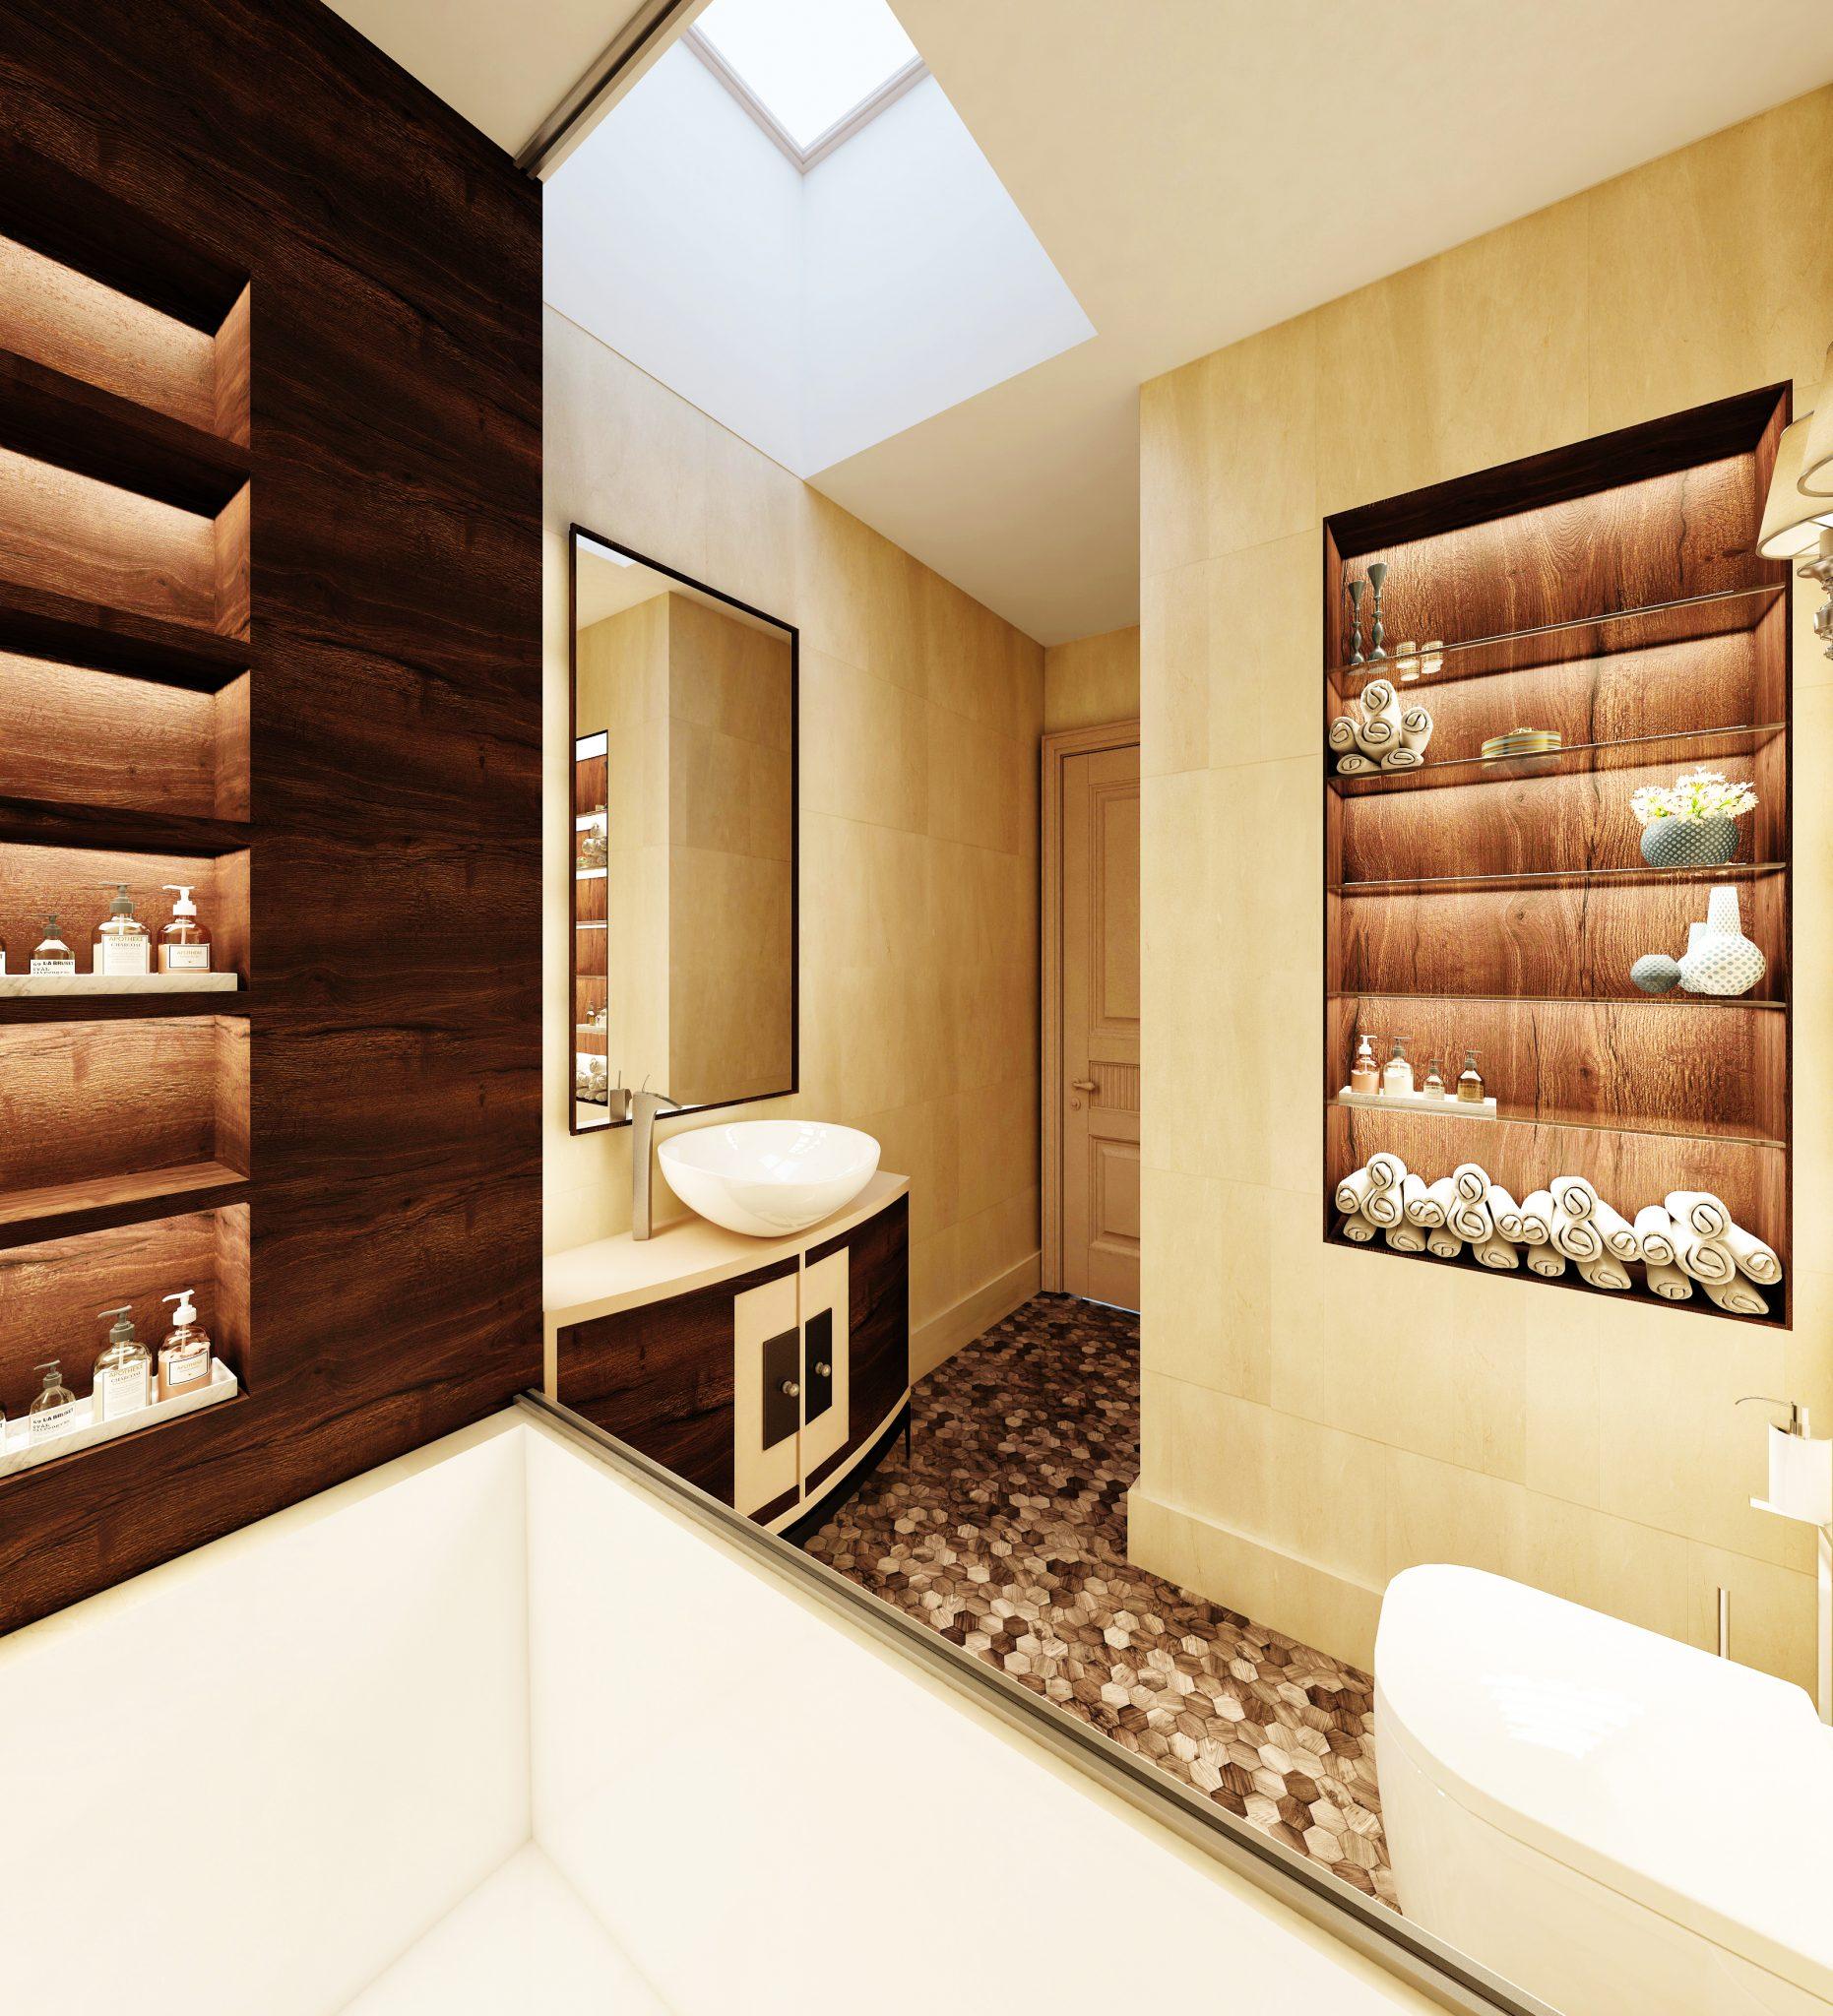 466-Bathroom Visualisation v3